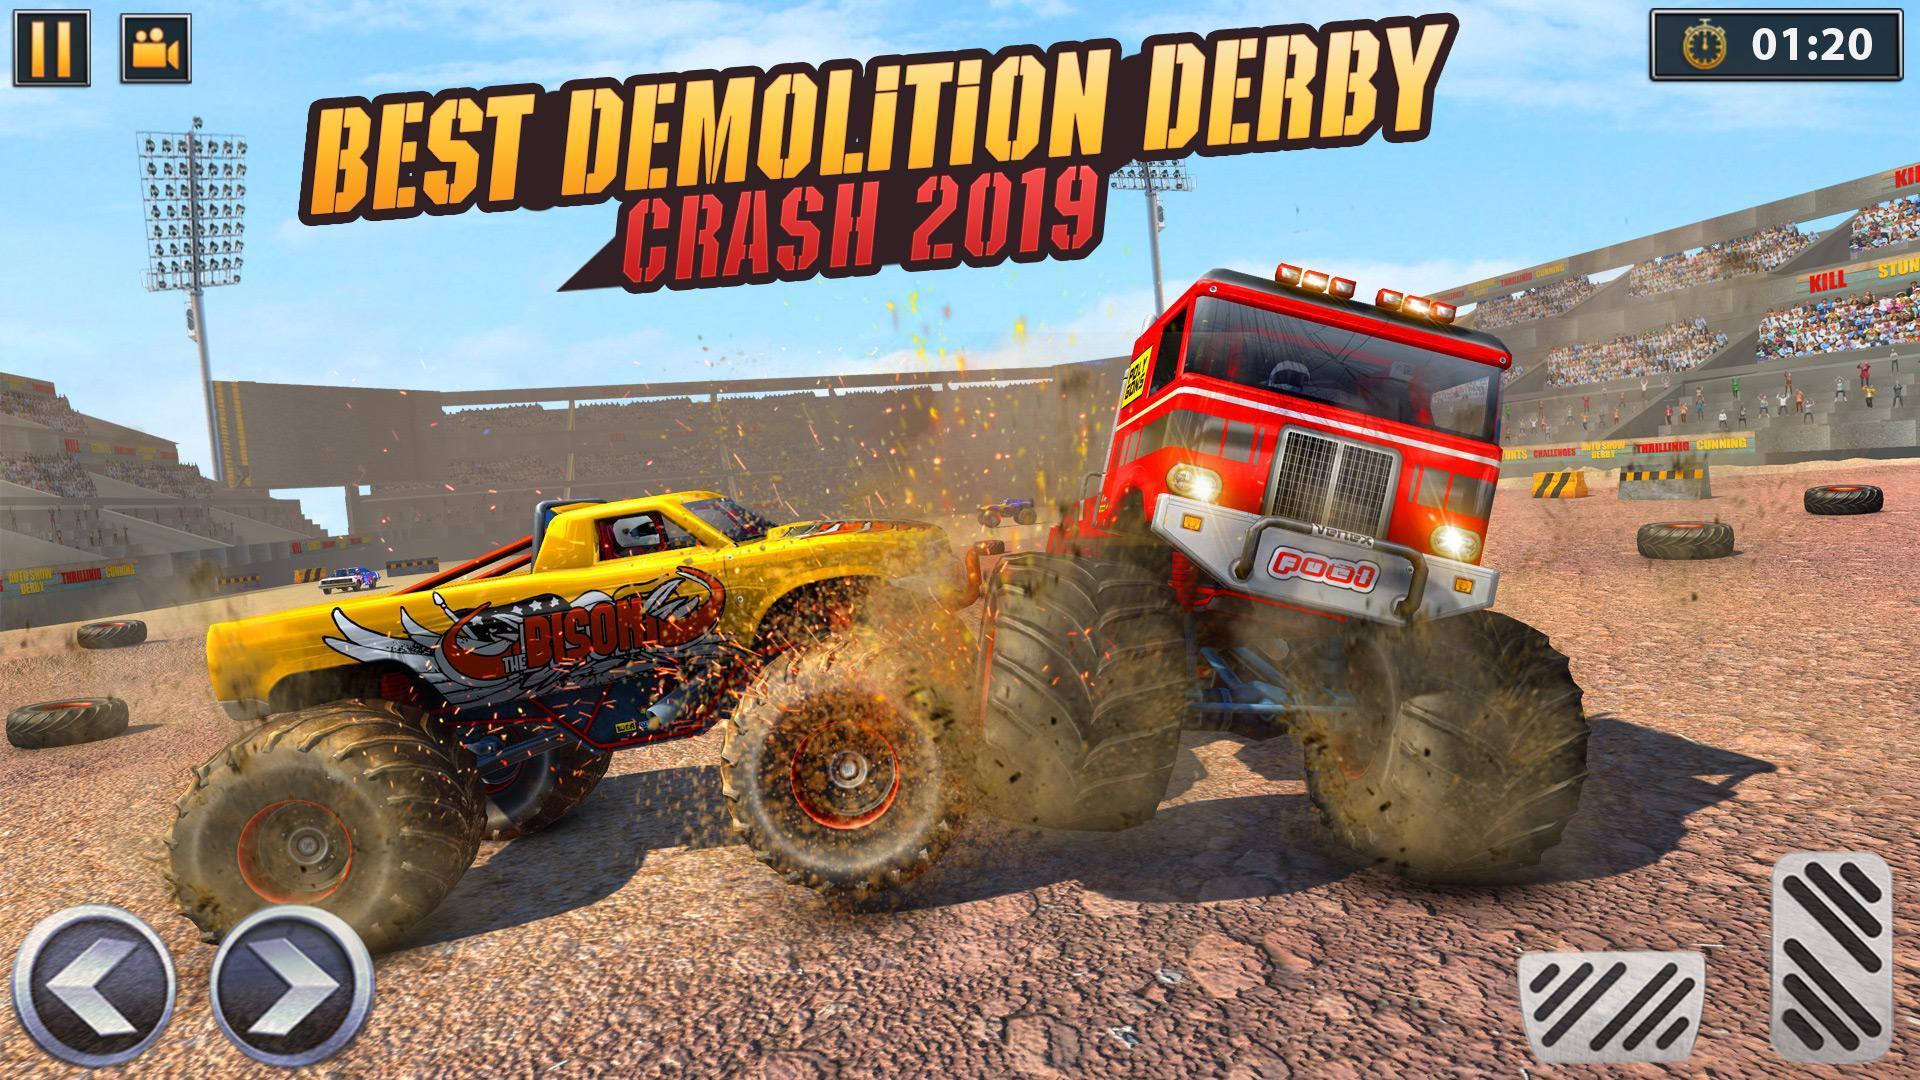 Real Monster Truck Demolition Derby Crash Stunts 3.0.3 Screenshot 12